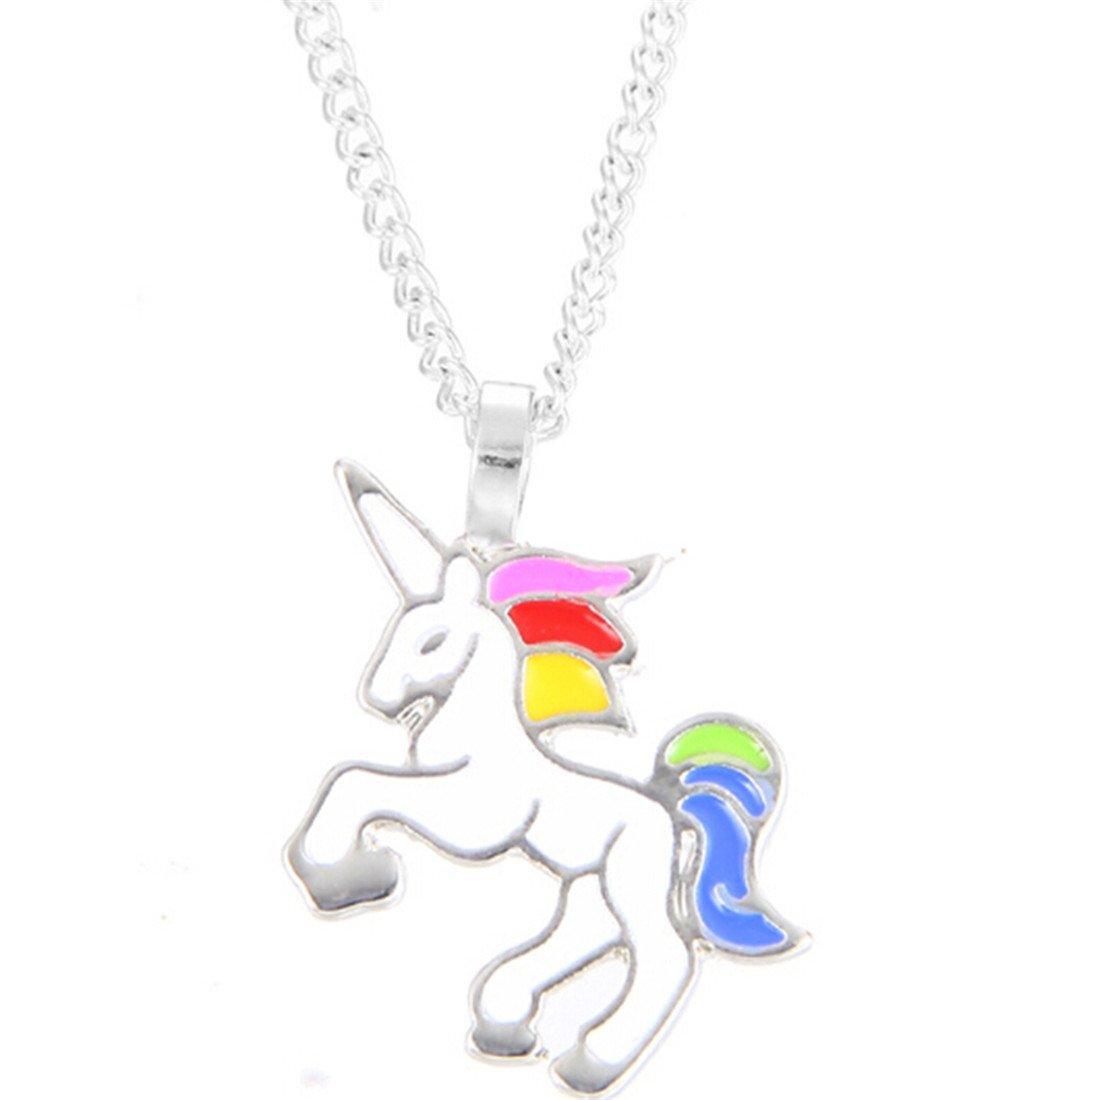 VWH 1 pcs Women Girls Alloy Necklace Unicorn Pendant Clavicle Bone Chain Necklace Jewelry Gift, Silver Colour